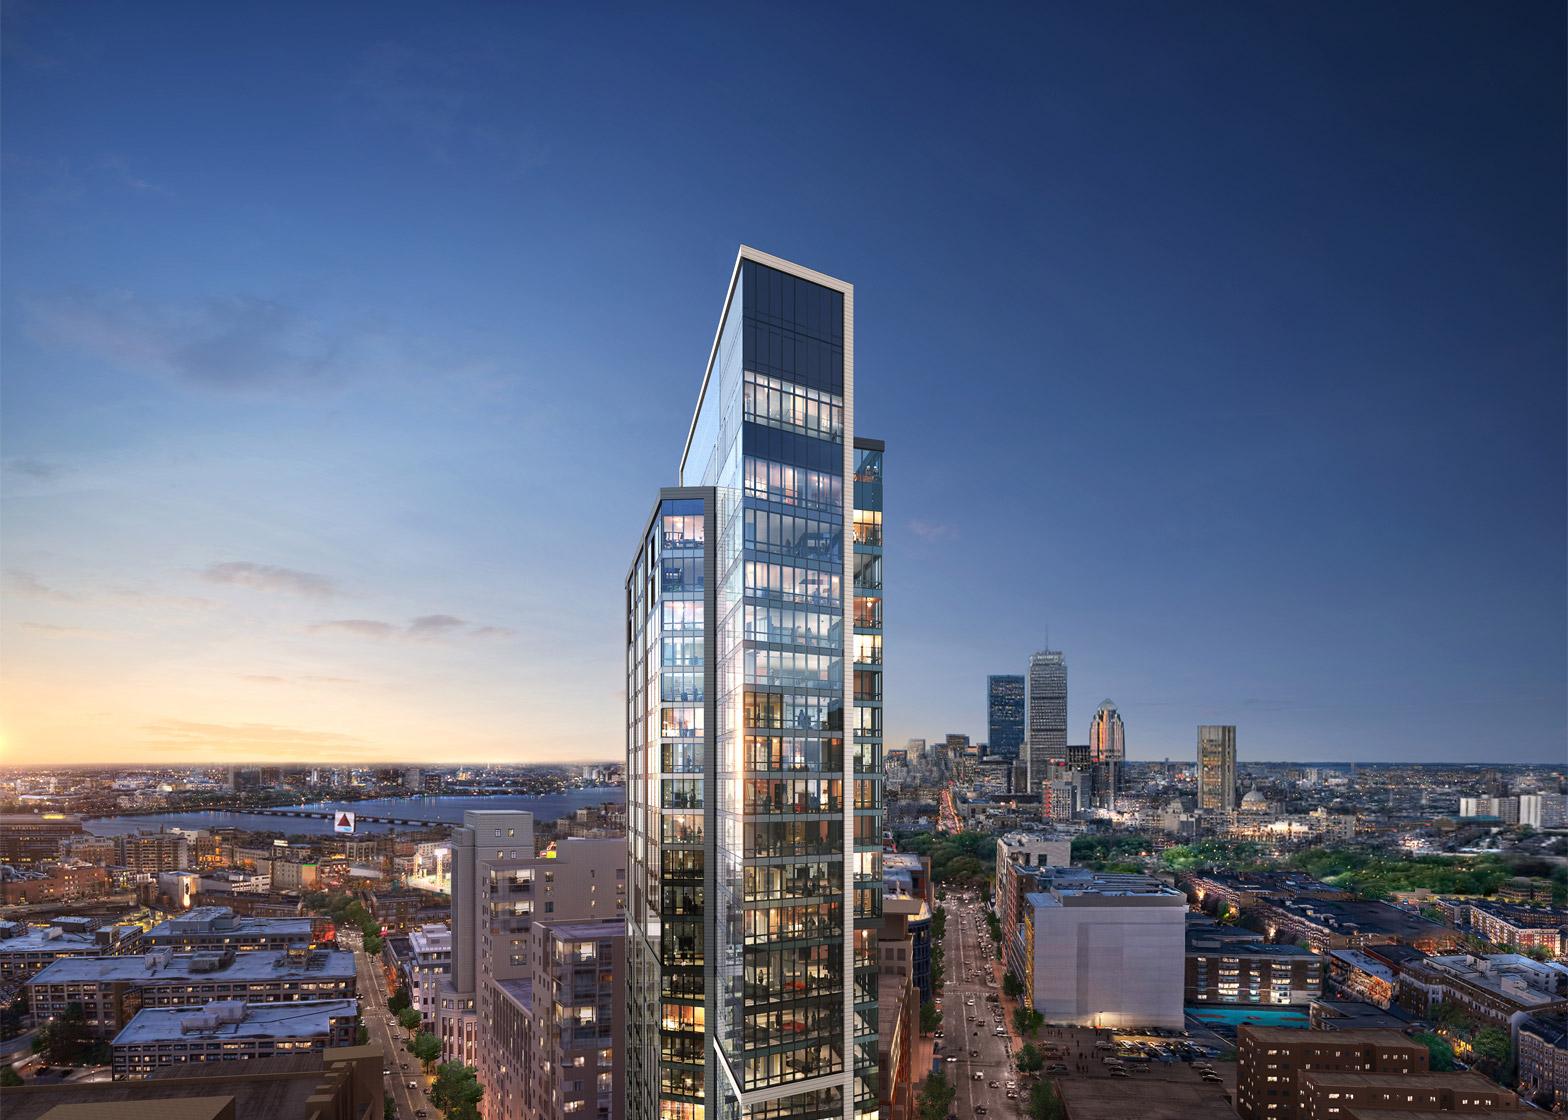 Pierce Boston by Arquitectonica